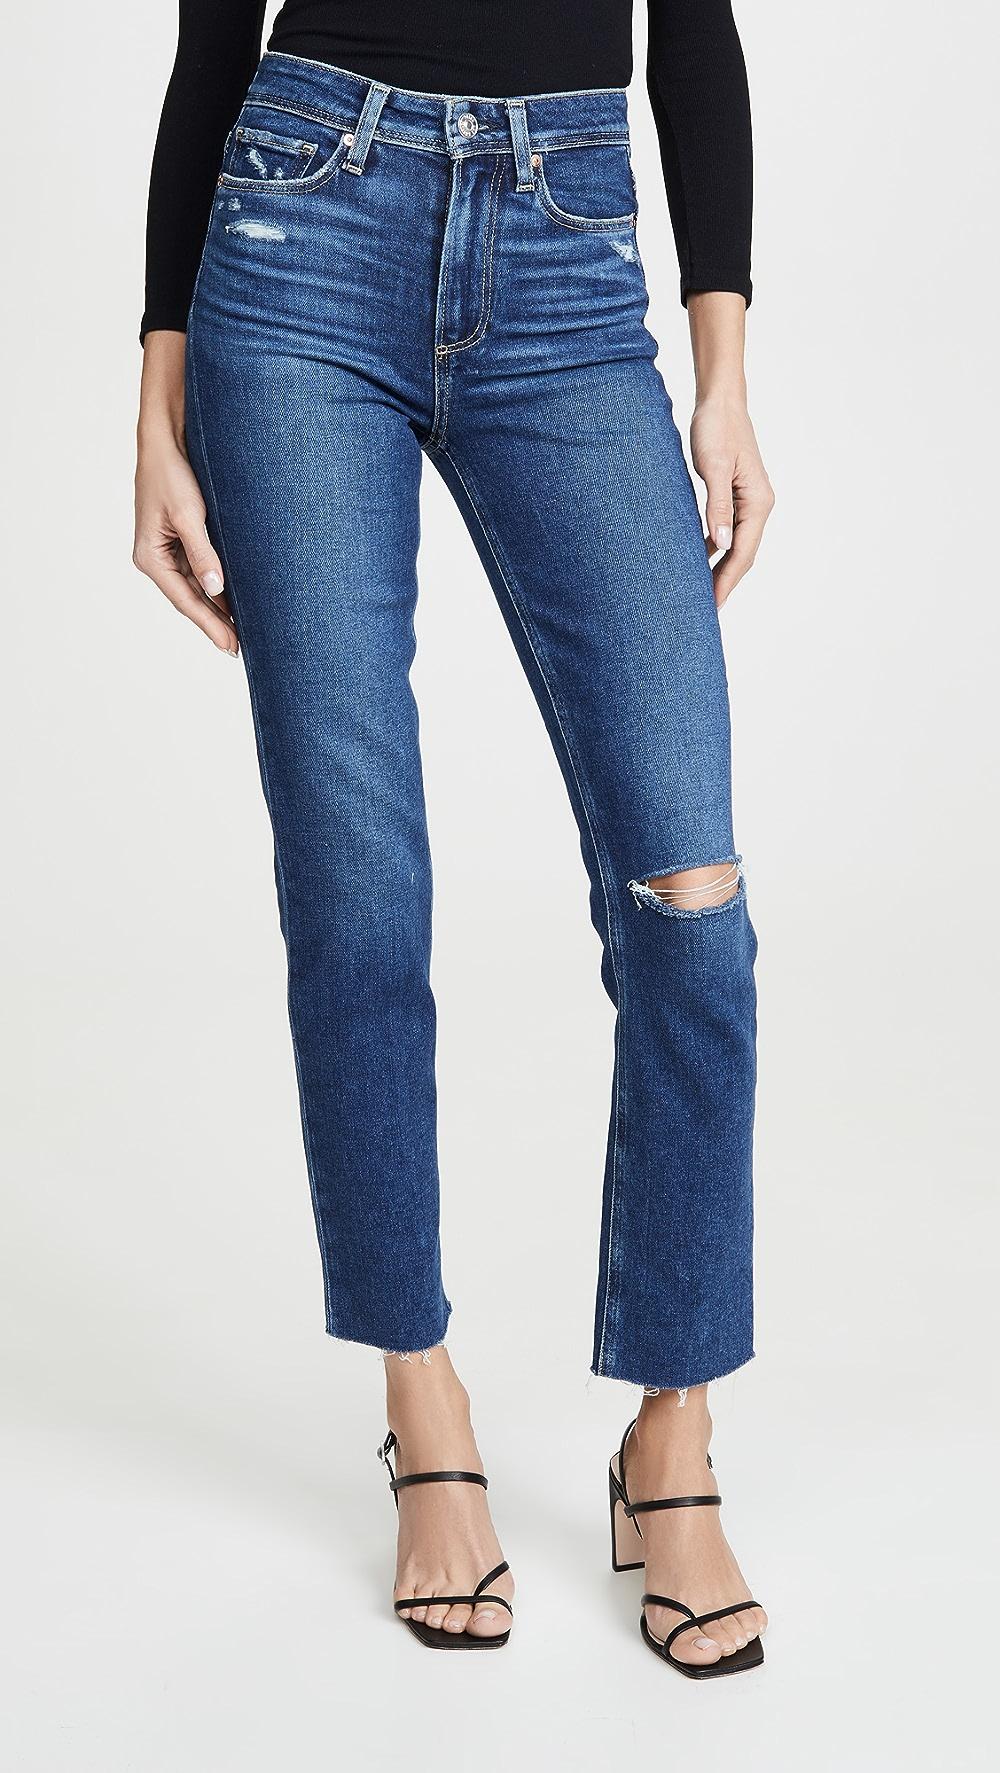 Honesty Paige - Hoxton Slim Jeans Waterproof, Shock-Resistant And Antimagnetic